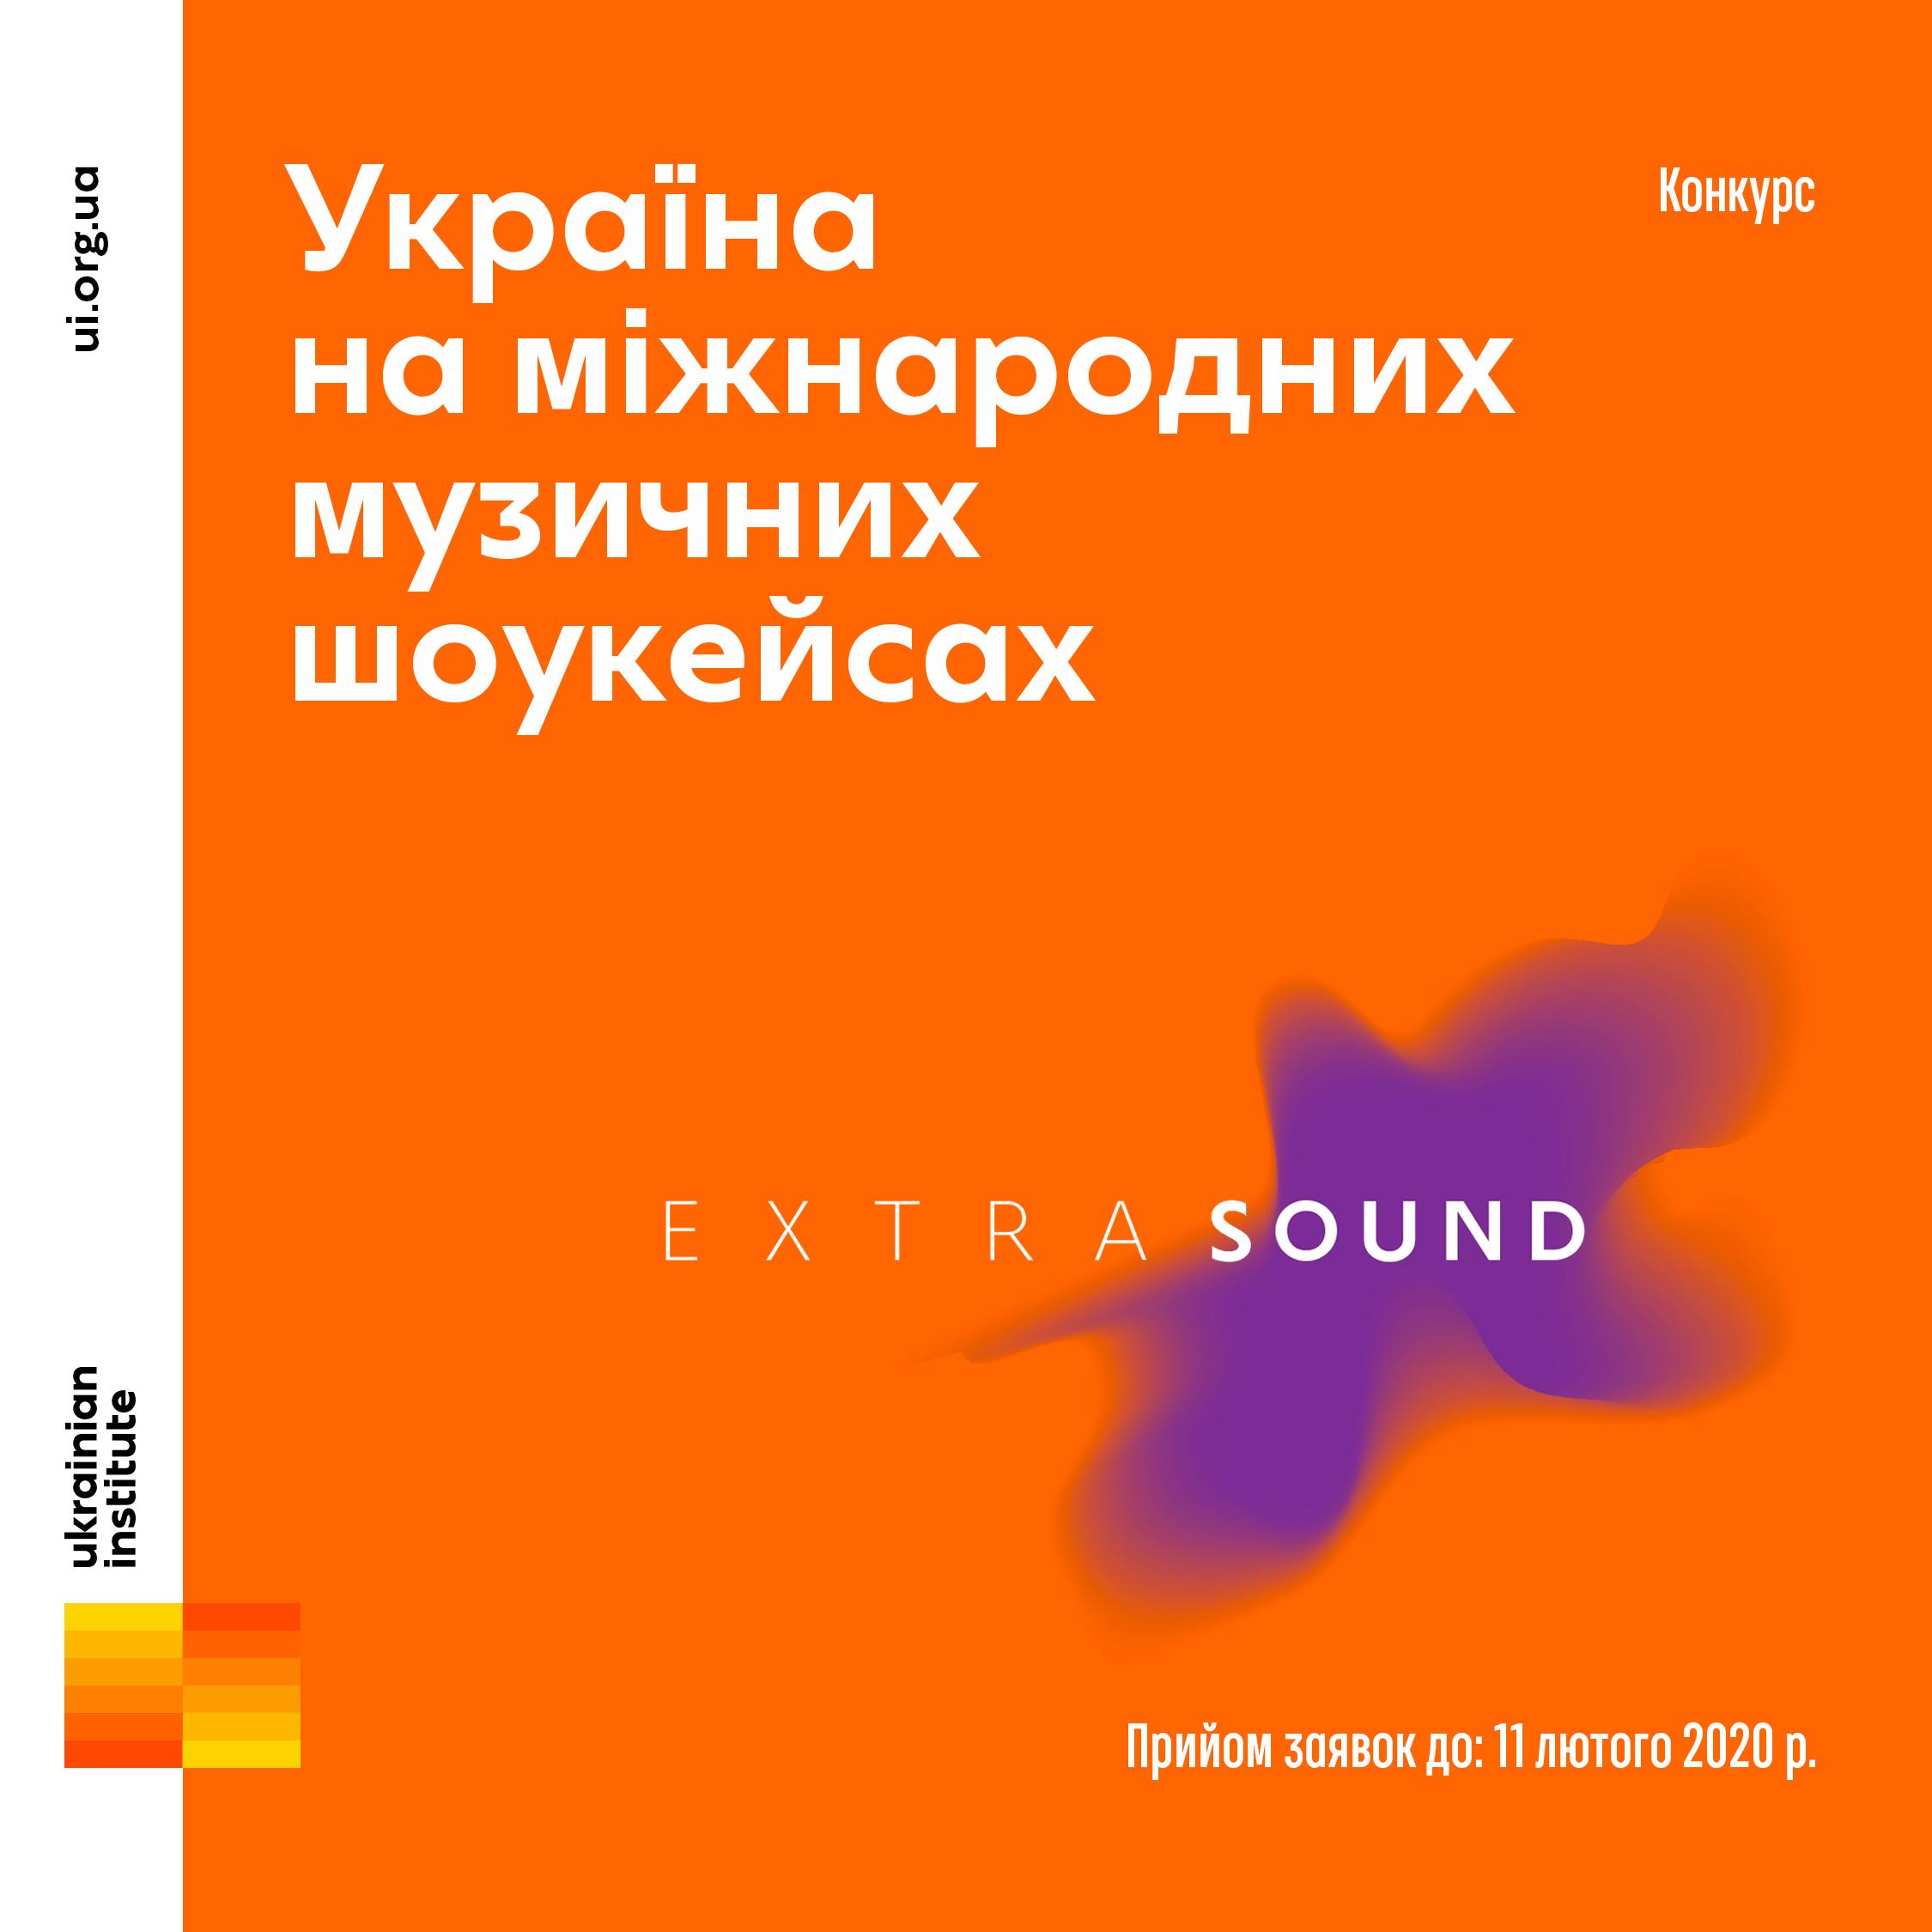 EXTRA SOUND